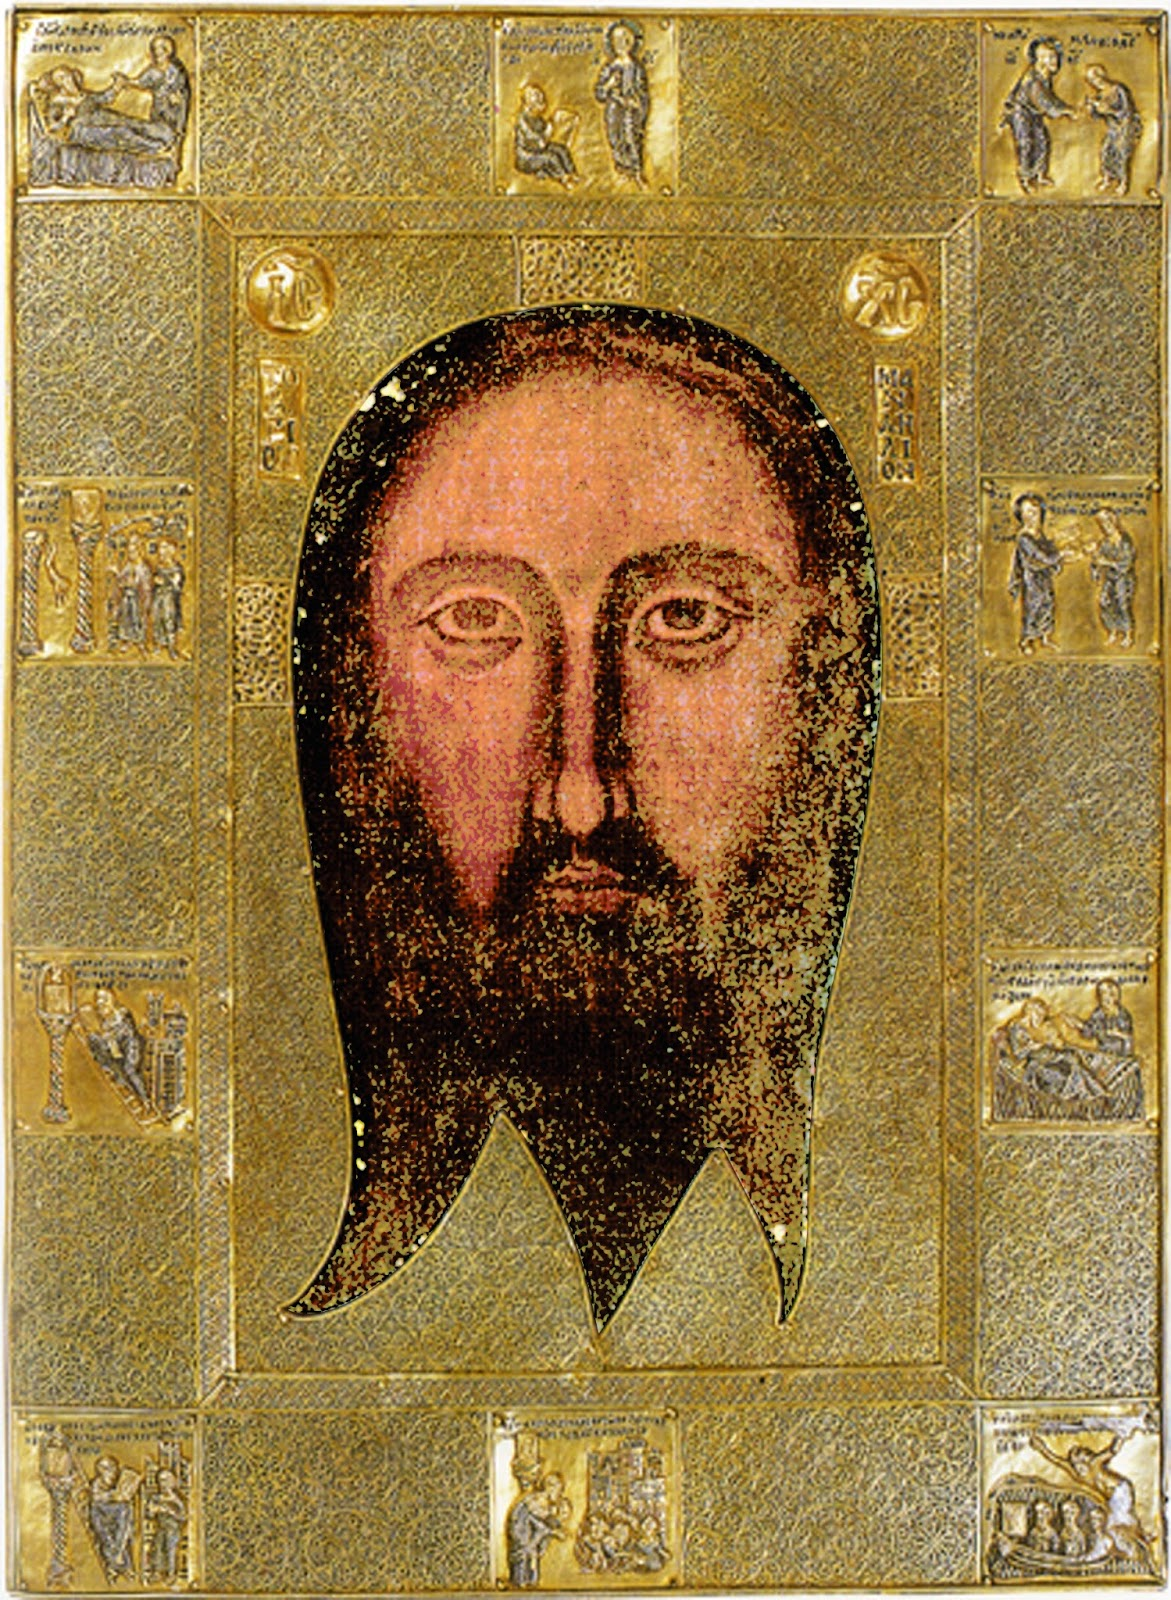 Jesus_Christ_Face_Holy-face-of-Genoa-_Genes